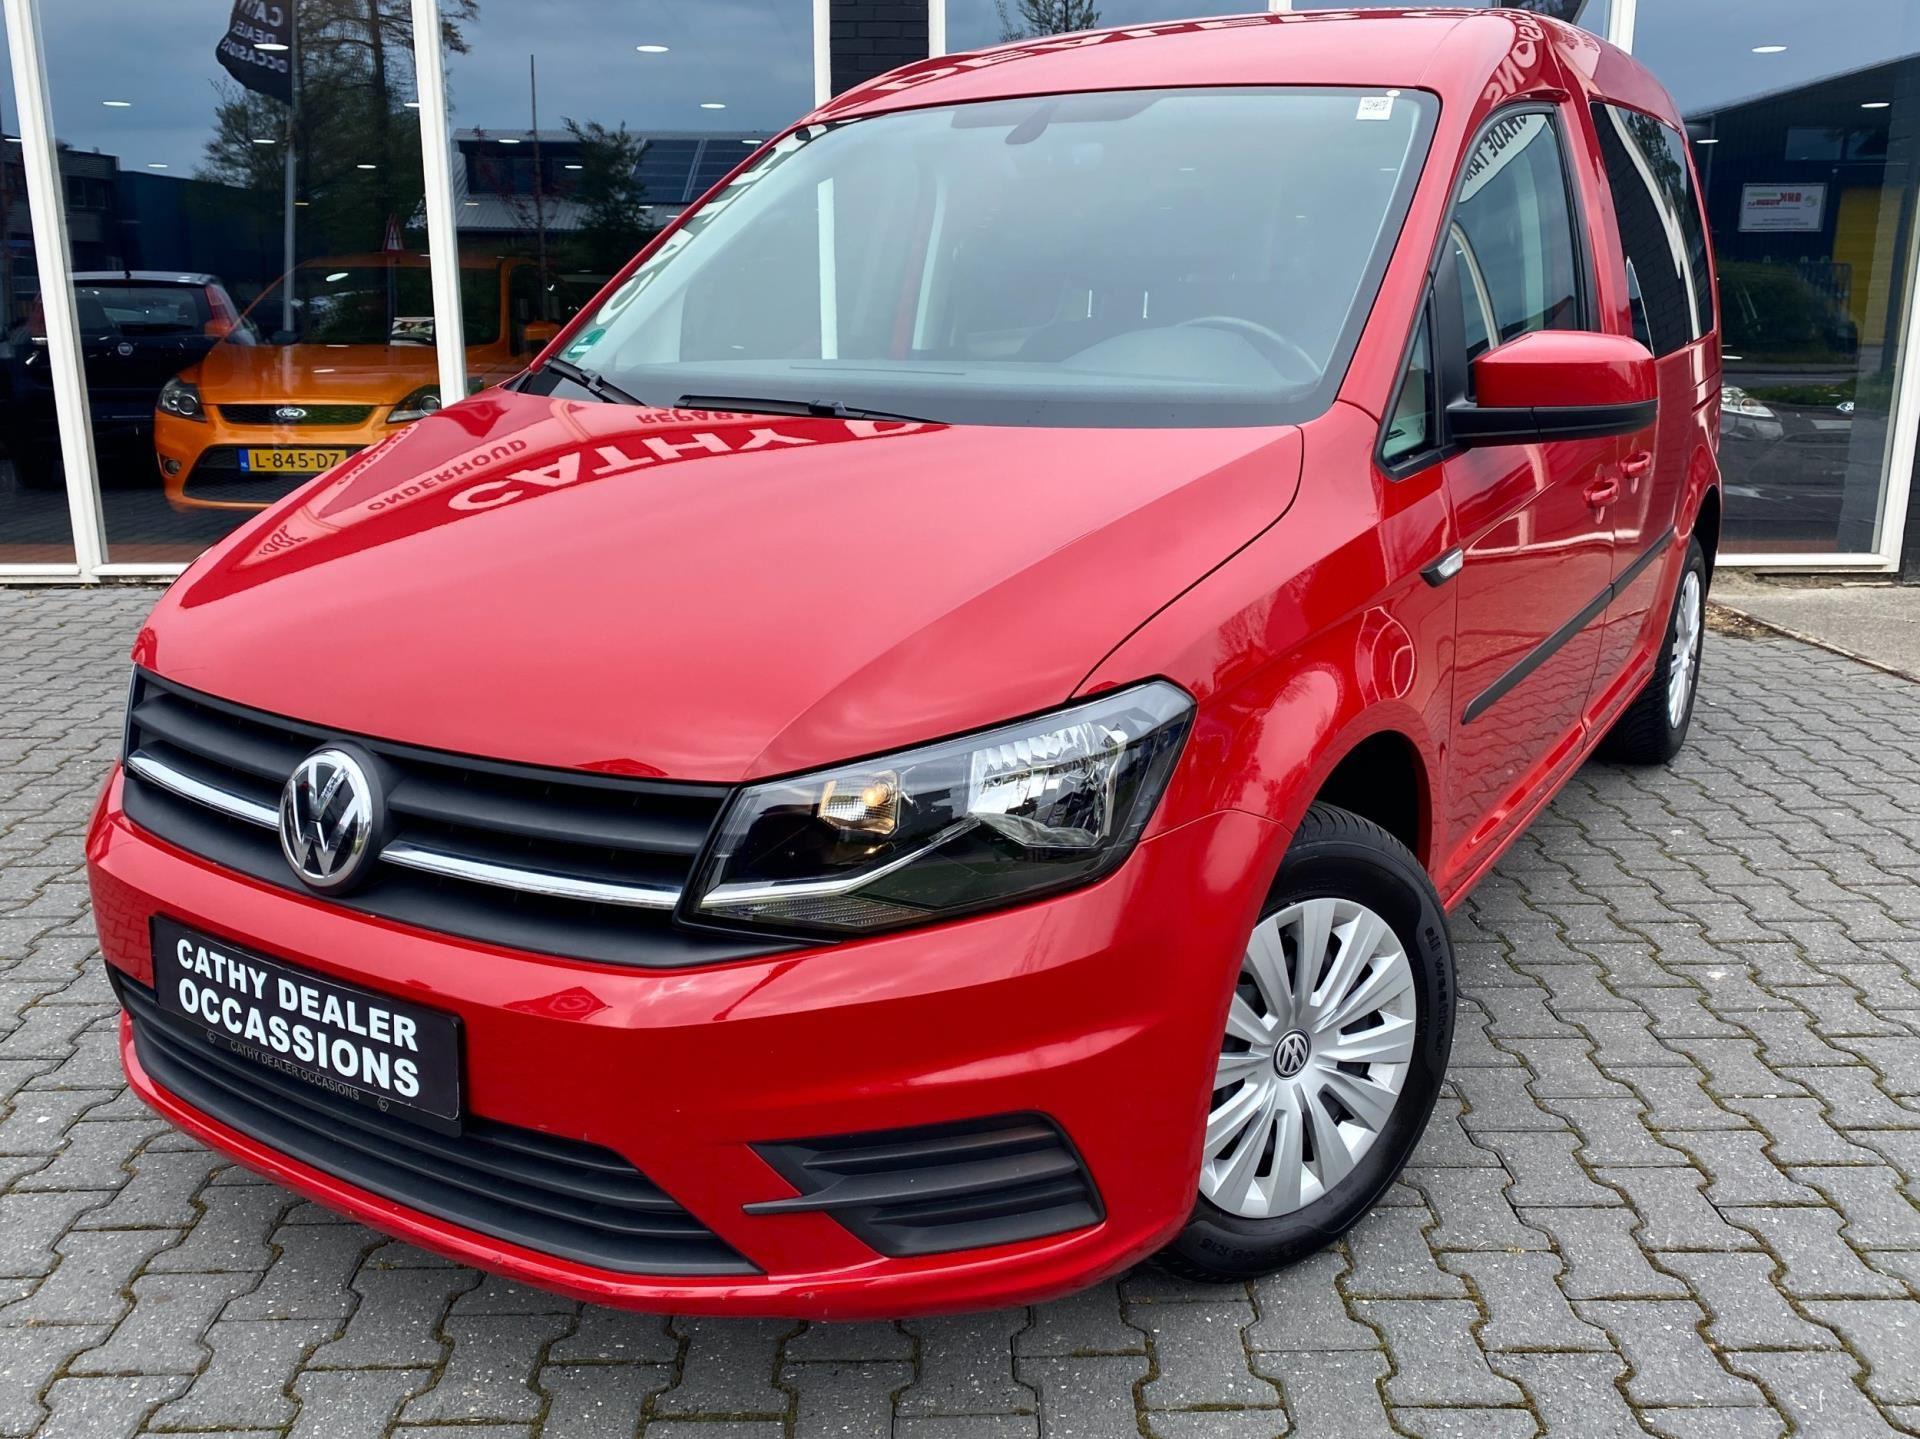 Volkswagen Caddy Combi occasion - Cathy Dealer Occasions